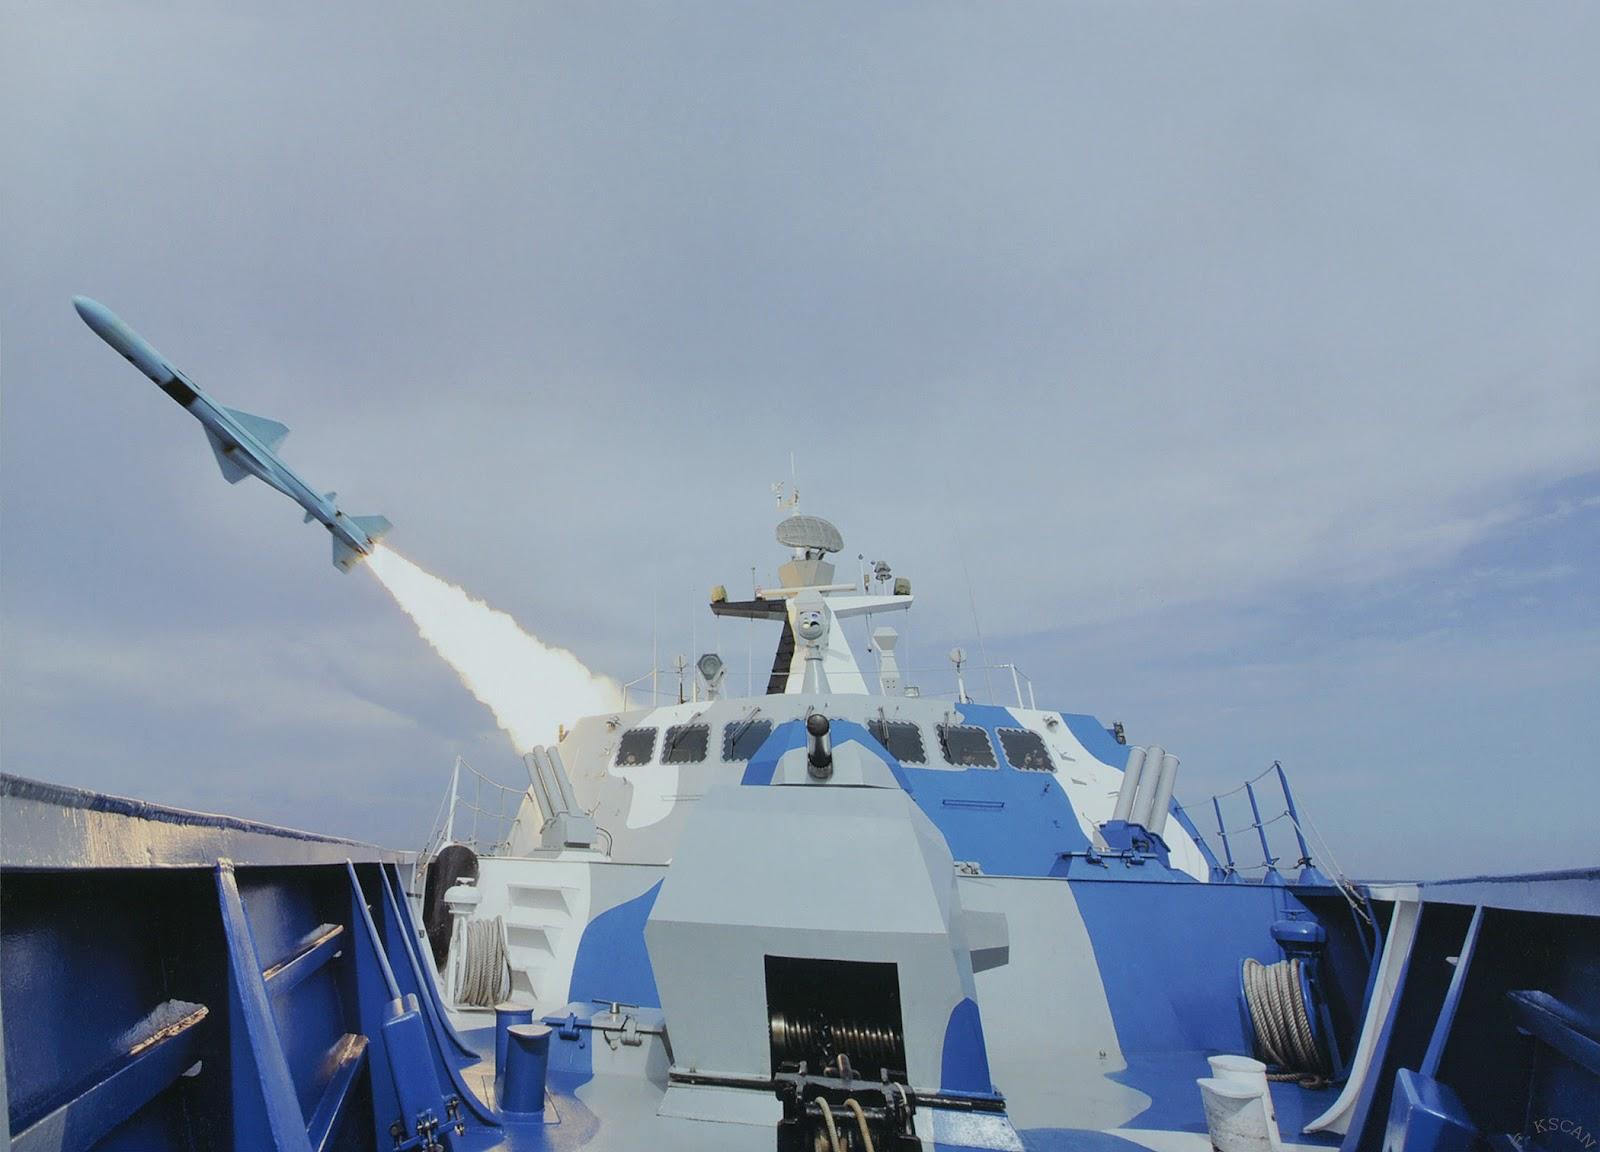 Fuerzas Armadas de la República Popular China - Página 3 Type+022+(Houbei+Class)+Fast+Attack+Missile+Craft+stealth+catamaran+hulls+People's+Liberation+Army+Navy+(PLAN+or+PLA+Navy)+test+firing+8+YJ-83+anti-ship+missiles+(1)